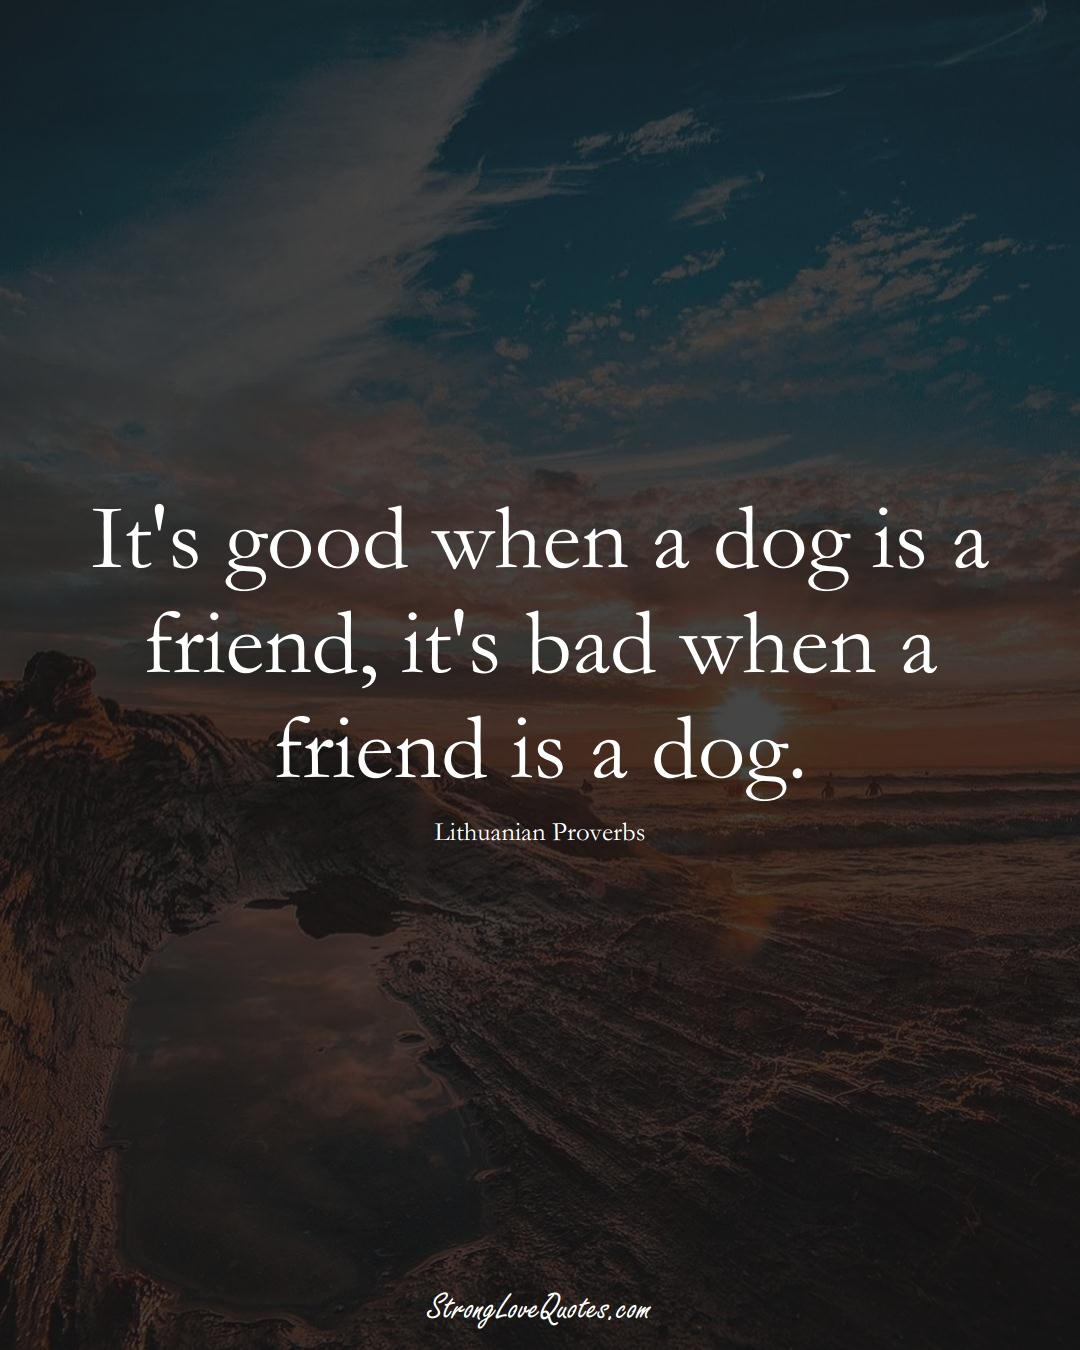 It's good when a dog is a friend, it's bad when a friend is a dog. (Lithuanian Sayings);  #AsianSayings